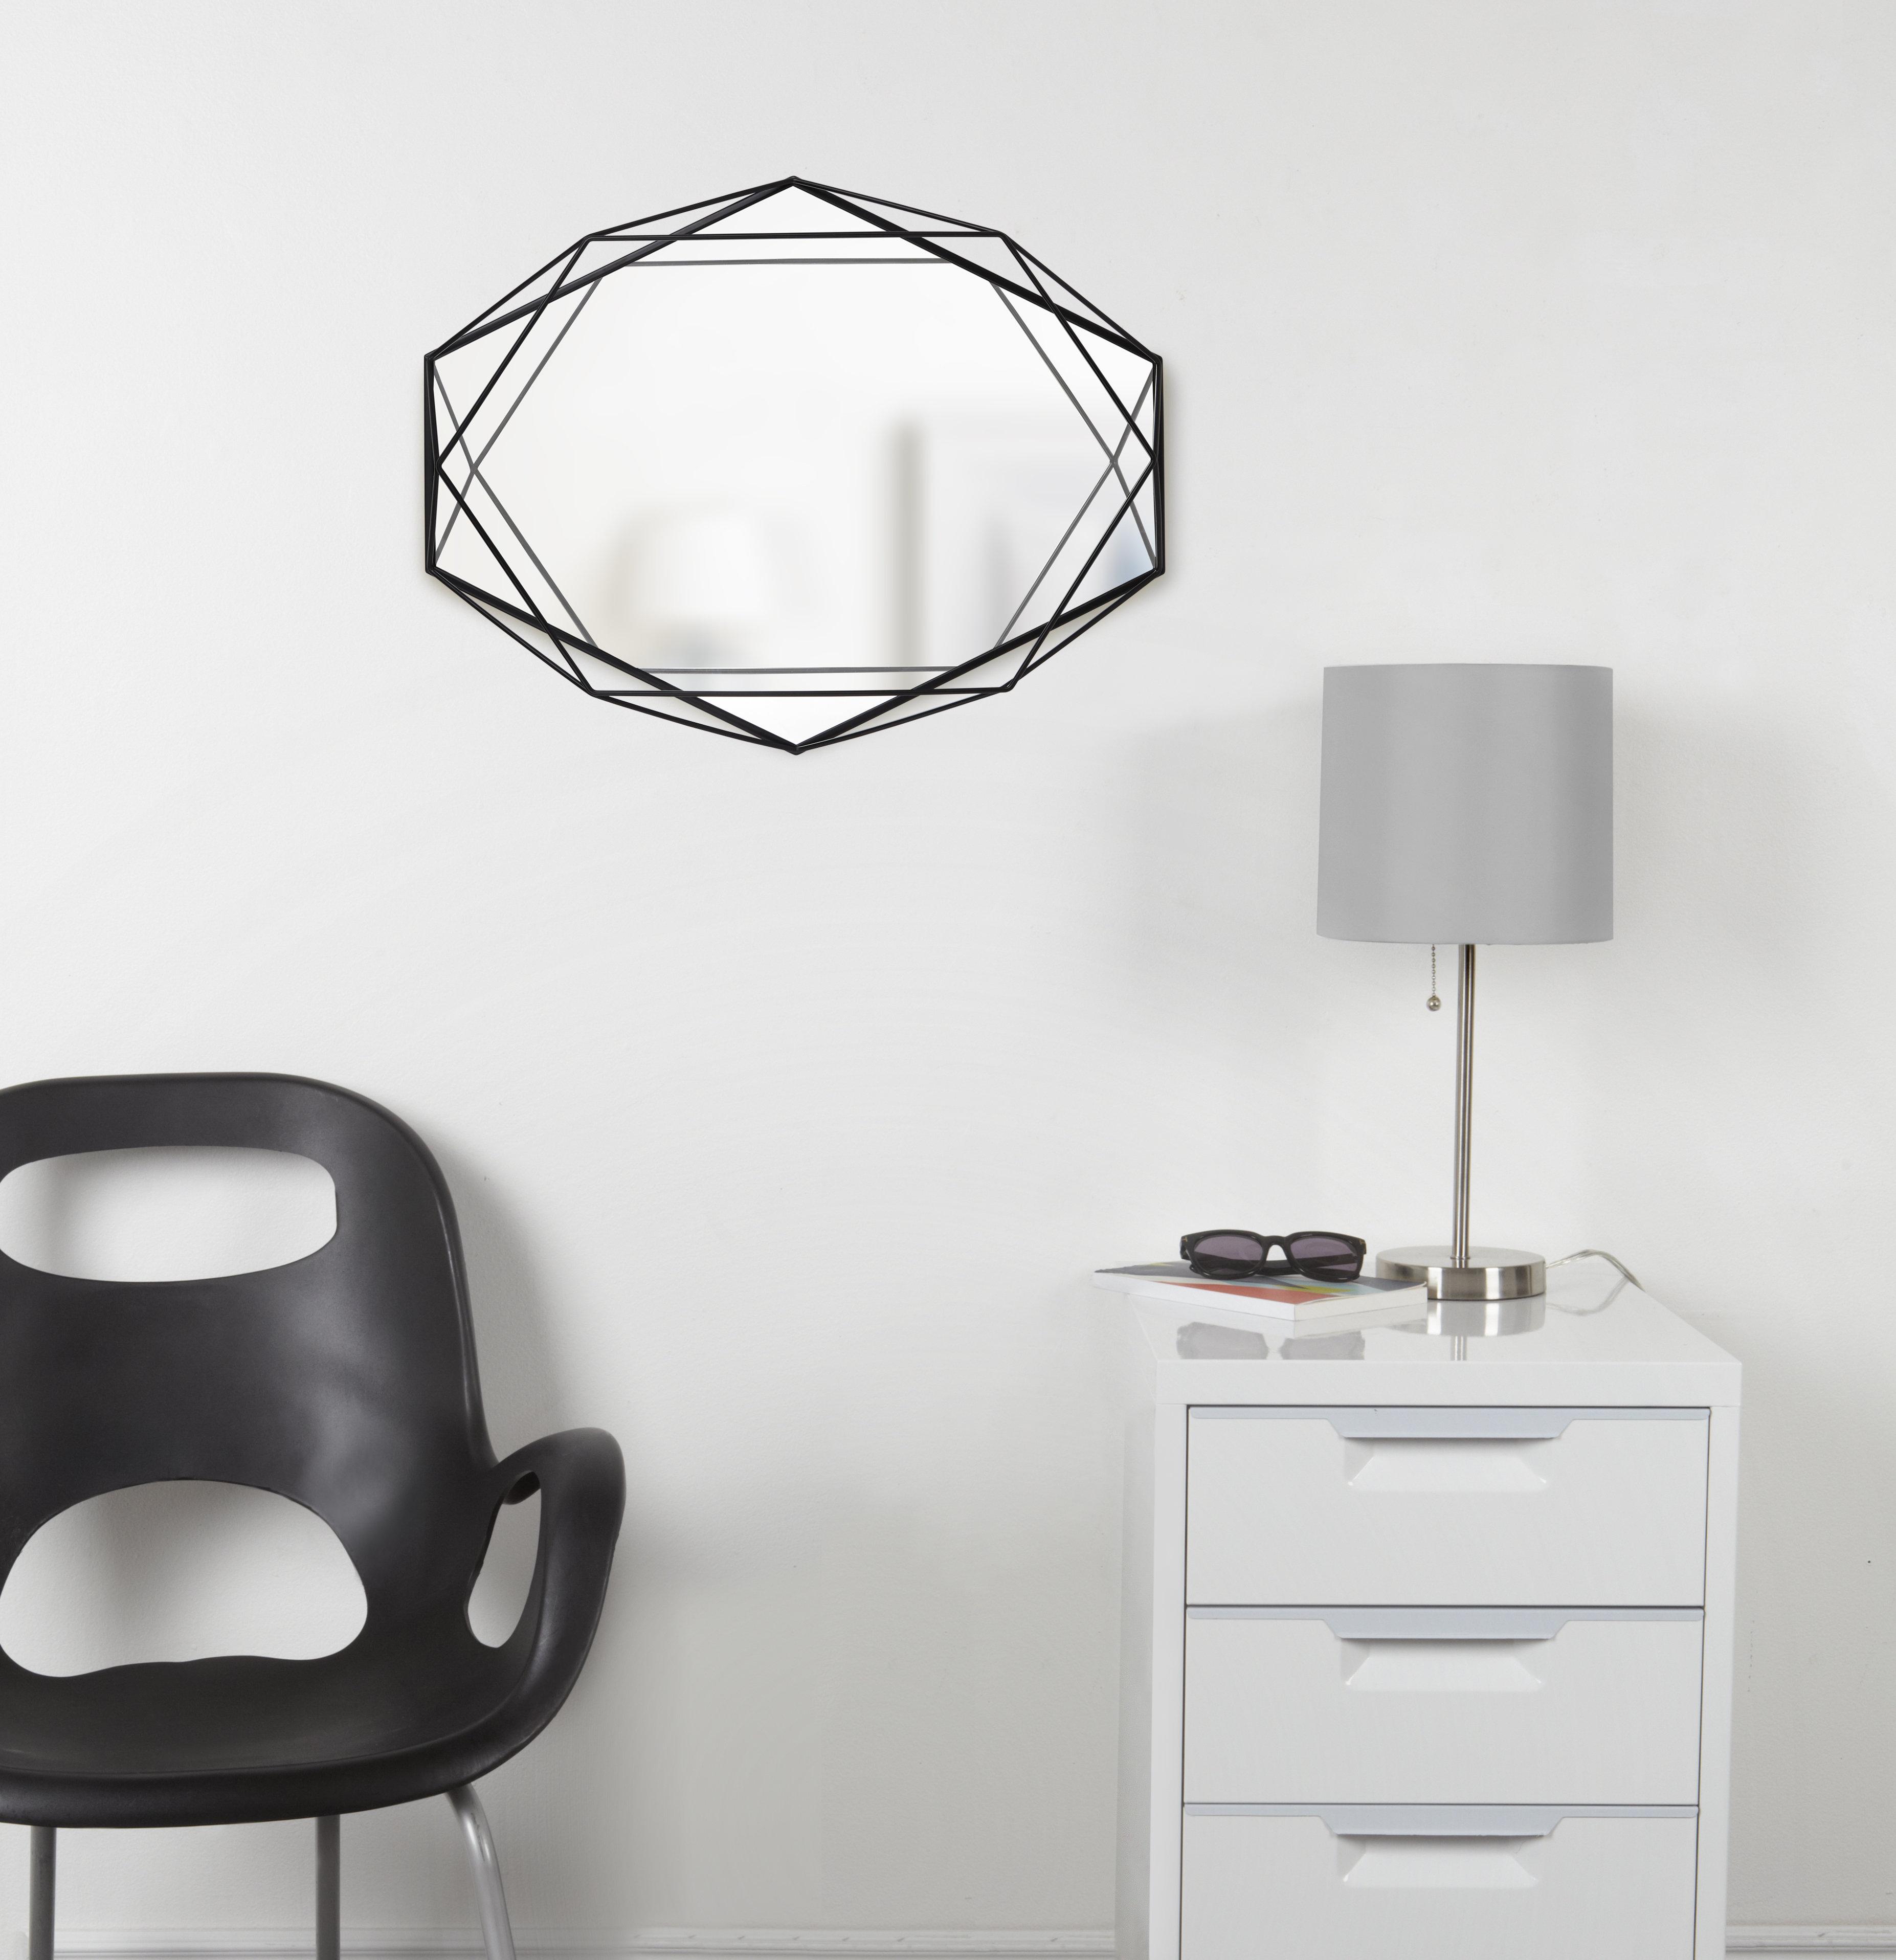 Prisma Modern & Contemporary Accent Mirror & Reviews | Joss Regarding Guidinha Modern & Contemporary Accent Mirrors (View 11 of 20)